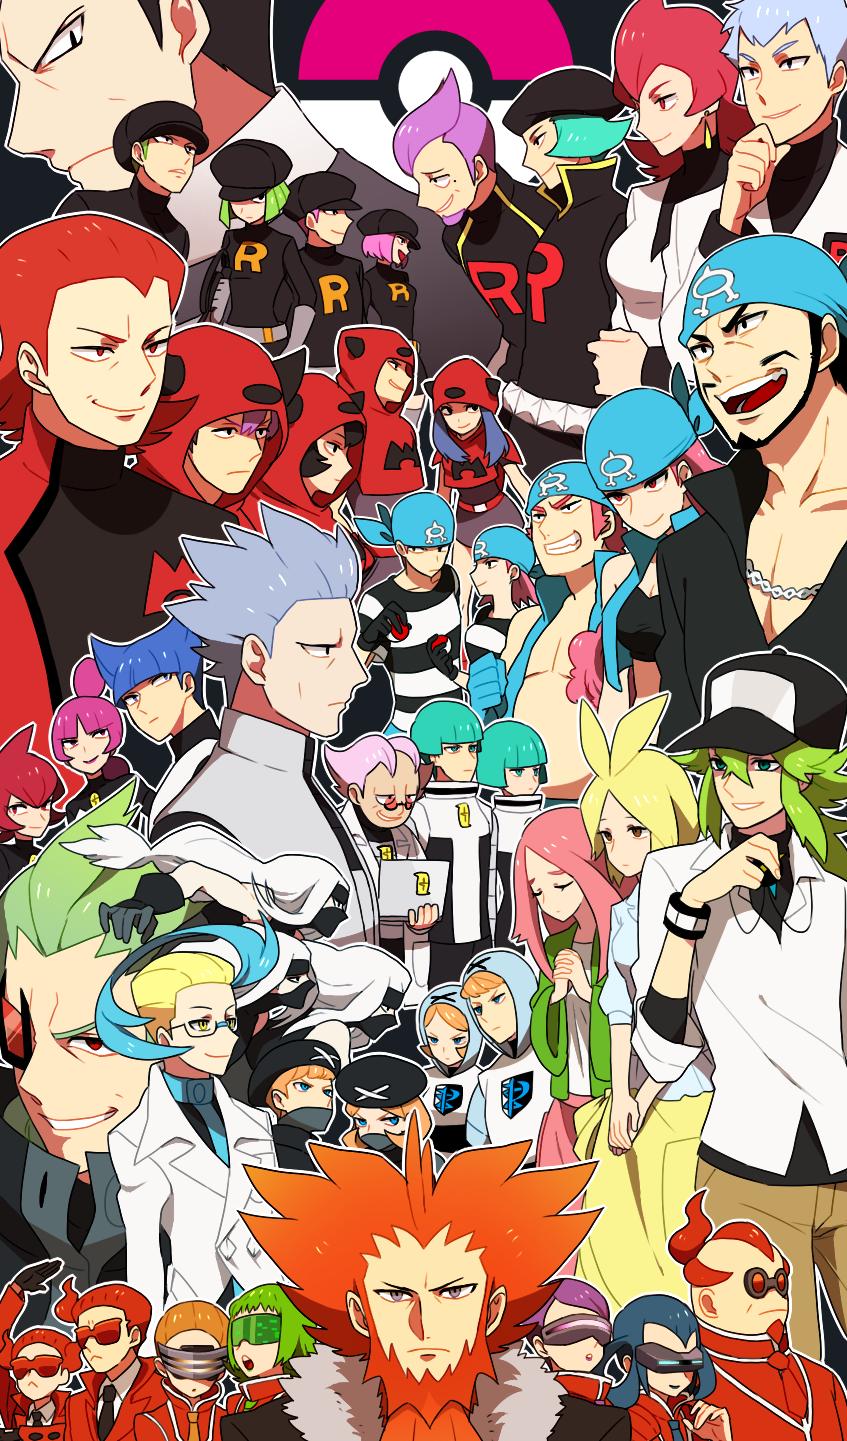 akagi_(pokemon) akebi_(pokemon) akuroma_(pokemon) anthea_(pokemon) aogiri_(pokemon) apollo_(pokemon) athena_(pokemon) bara_(pokemon) concordia_(pokemon) correa_(pokemon) dark_trinity fleur-de-lis_(pokemon) geechisu_(pokemon) highres homura_(pokemon) izumi_(pokemon) jupiter_(pokemon) kagari_(pokemon) lambda_(pokemon) lance_(pokemon) li_sakura mars_(pokemon) matsubusa_(pokemon) momiji_(pokemon) n_(pokemon) pluto_(pokemon) pokemon pokemon_(game) pokemon_bw pokemon_bw2 pokemon_dppt pokemon_frlg pokemon_hgss pokemon_rse pokemon_xy sakaki_(pokemon) saturn_(pokemon) team_aqua team_aqua_grunt team_flare team_flare_grunt team_galactic team_galactic_grunt team_magma team_magma_grunt team_plasma team_plasma_grunt team_rocket team_rocket_grunt ushio_(pokemon) xerosicy_(pokemon)